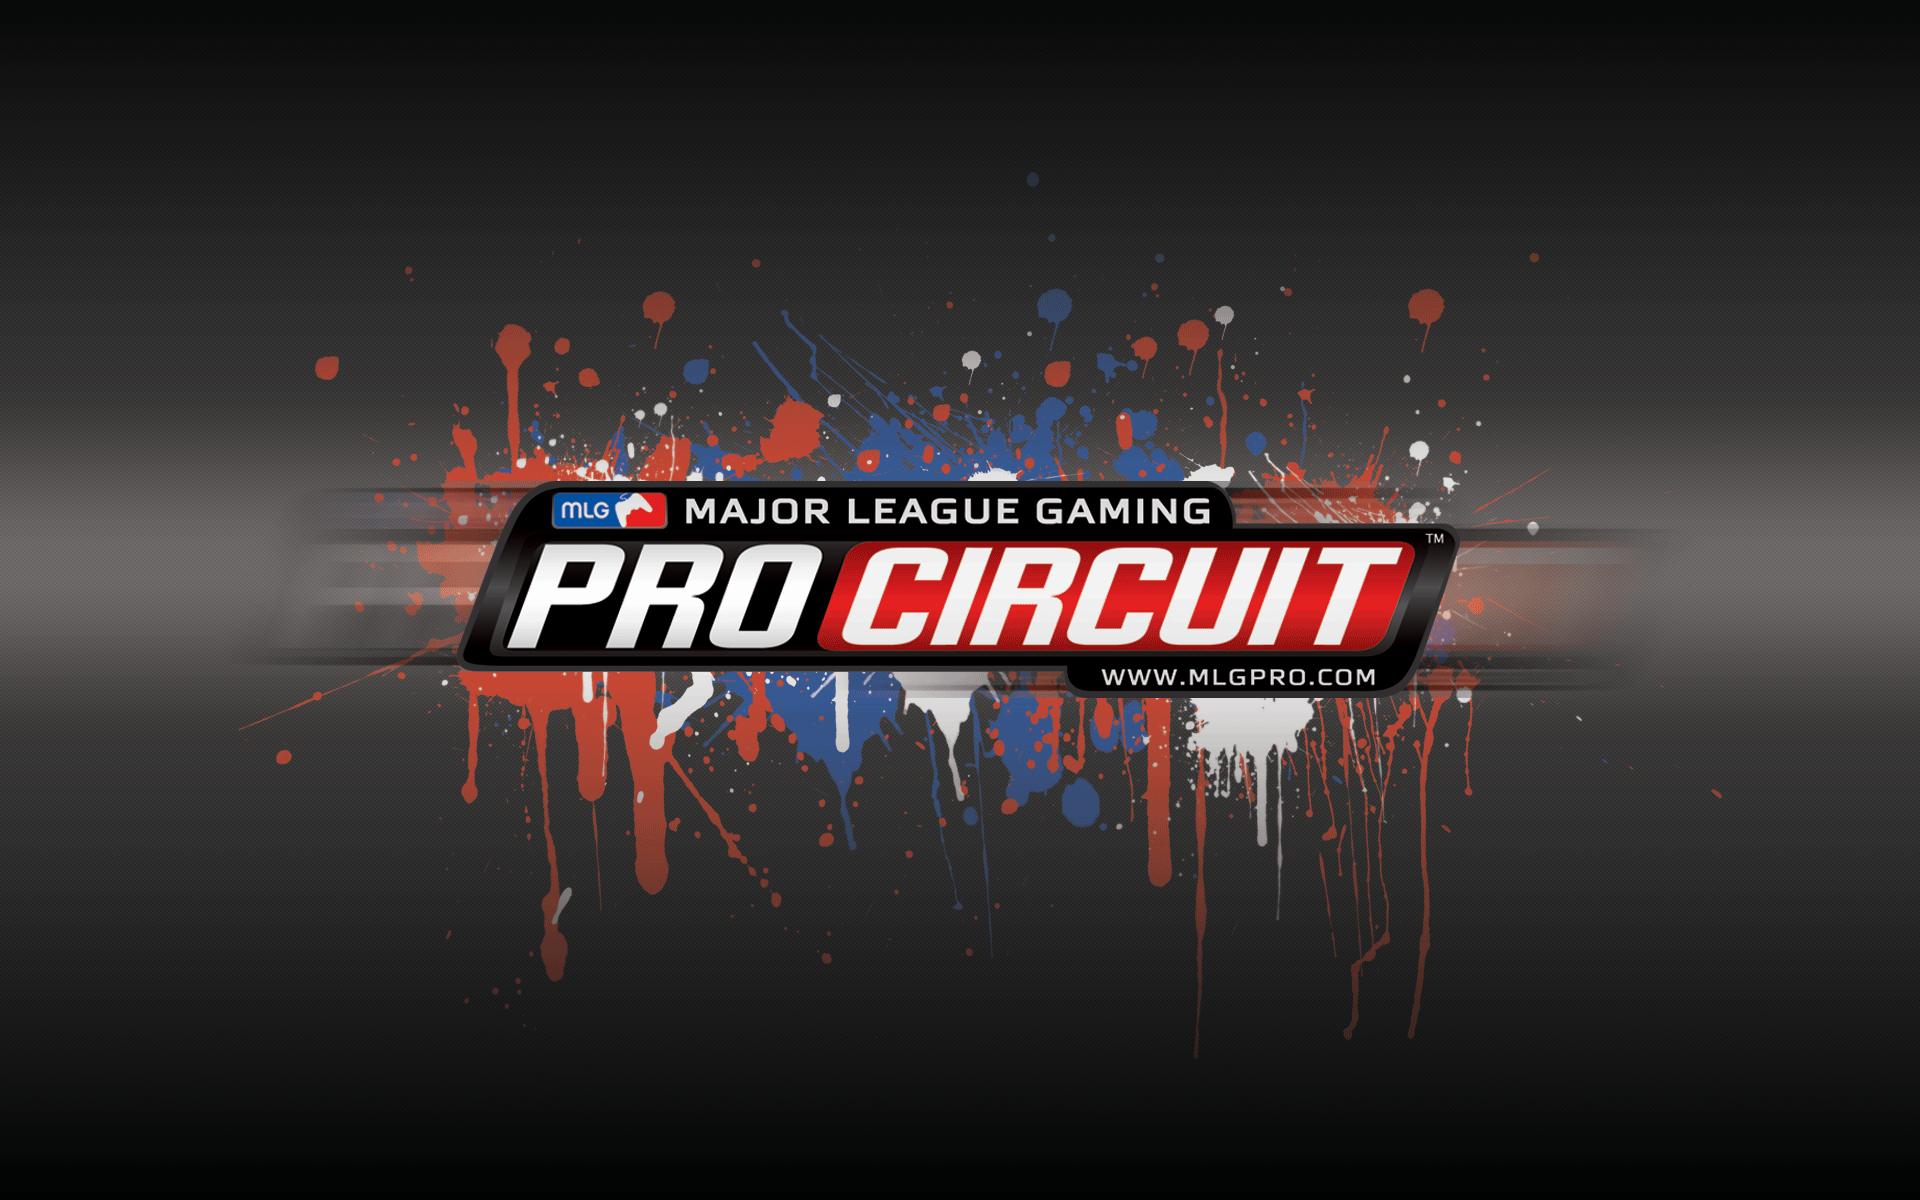 mlg pro circuit wallpaper 3410